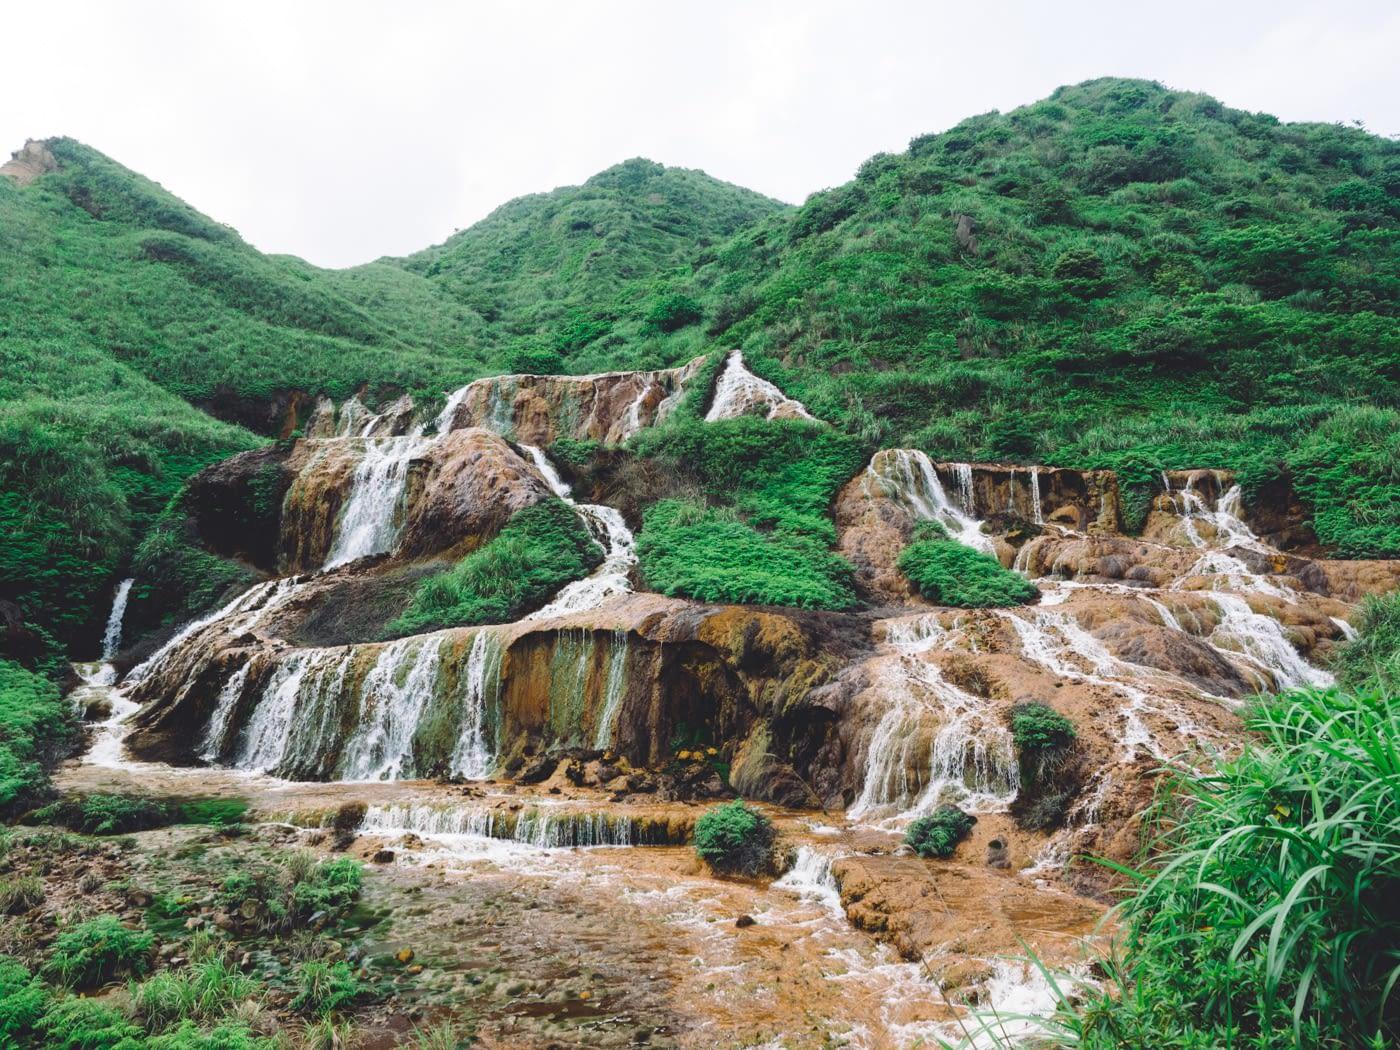 Taiwan - New Taipei City - Golden Waterfall upclose